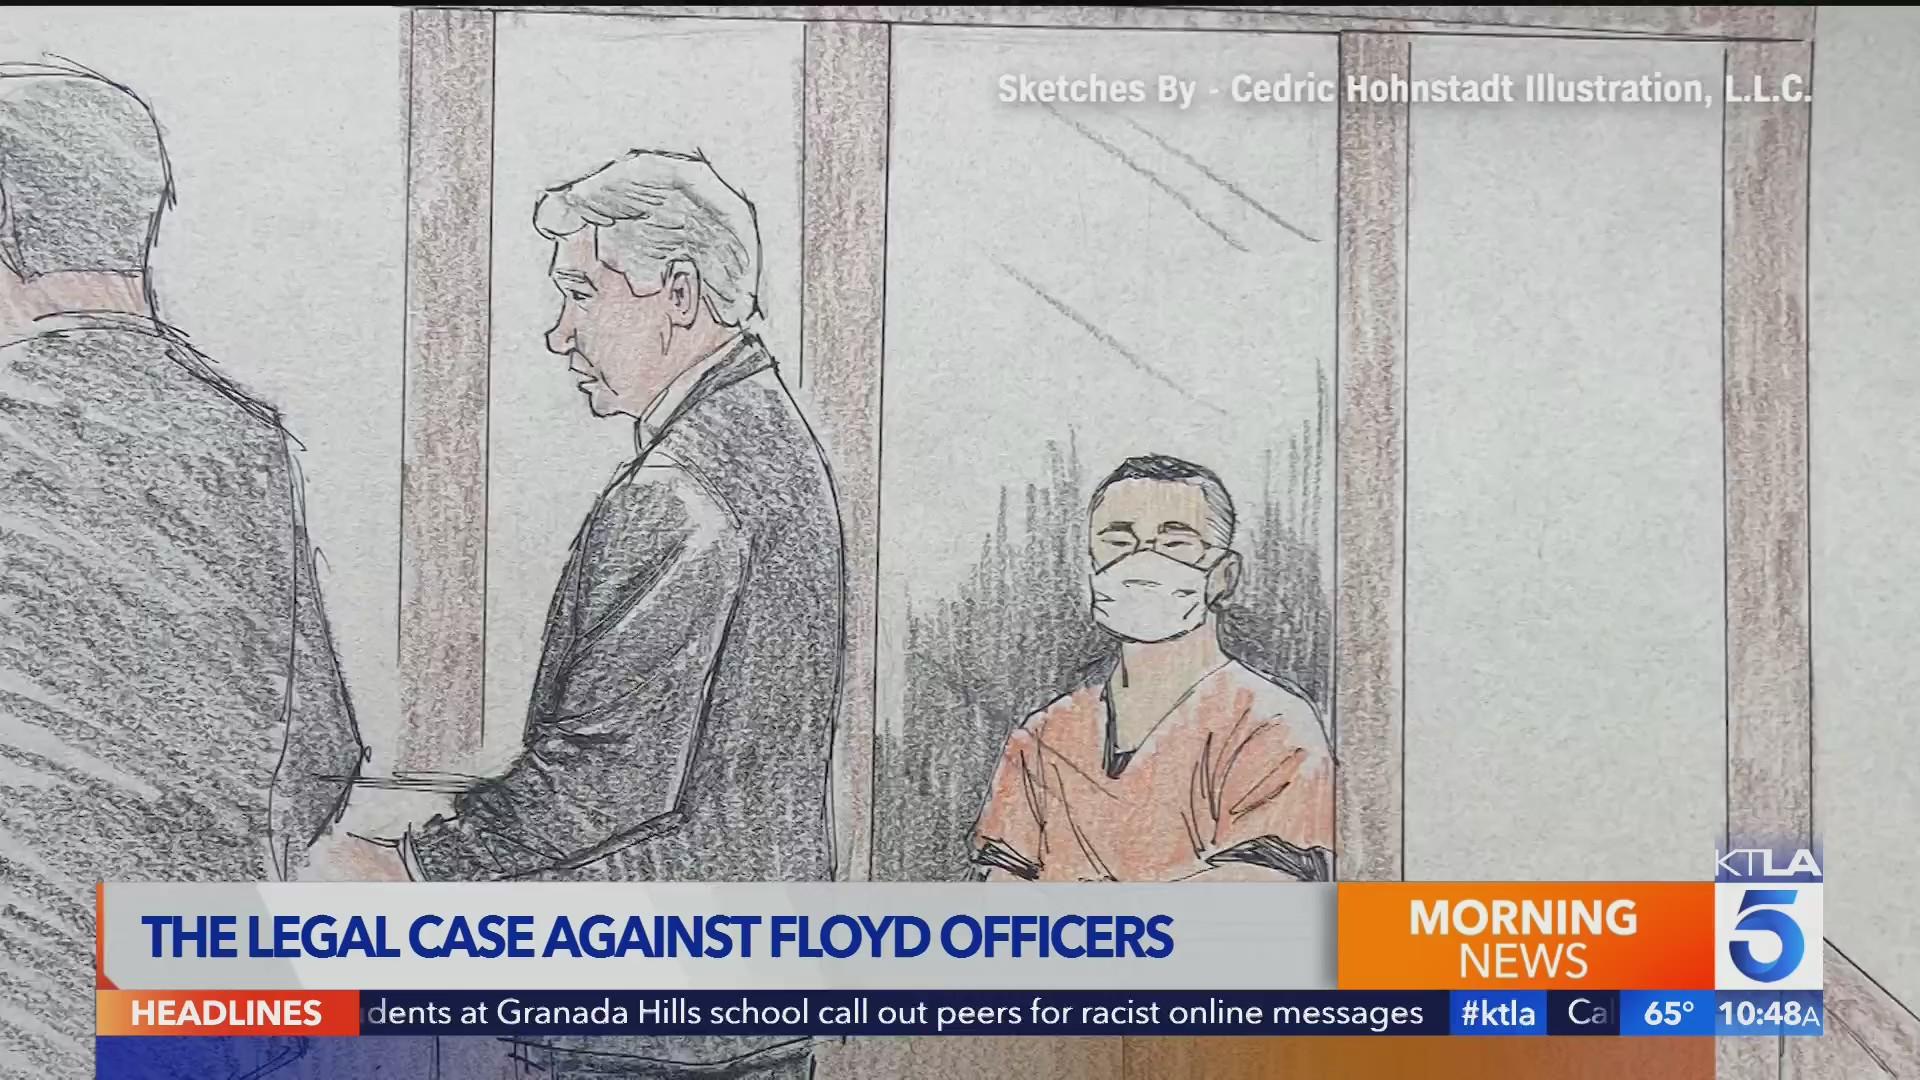 Alison Triessl on Floyd officers legal case